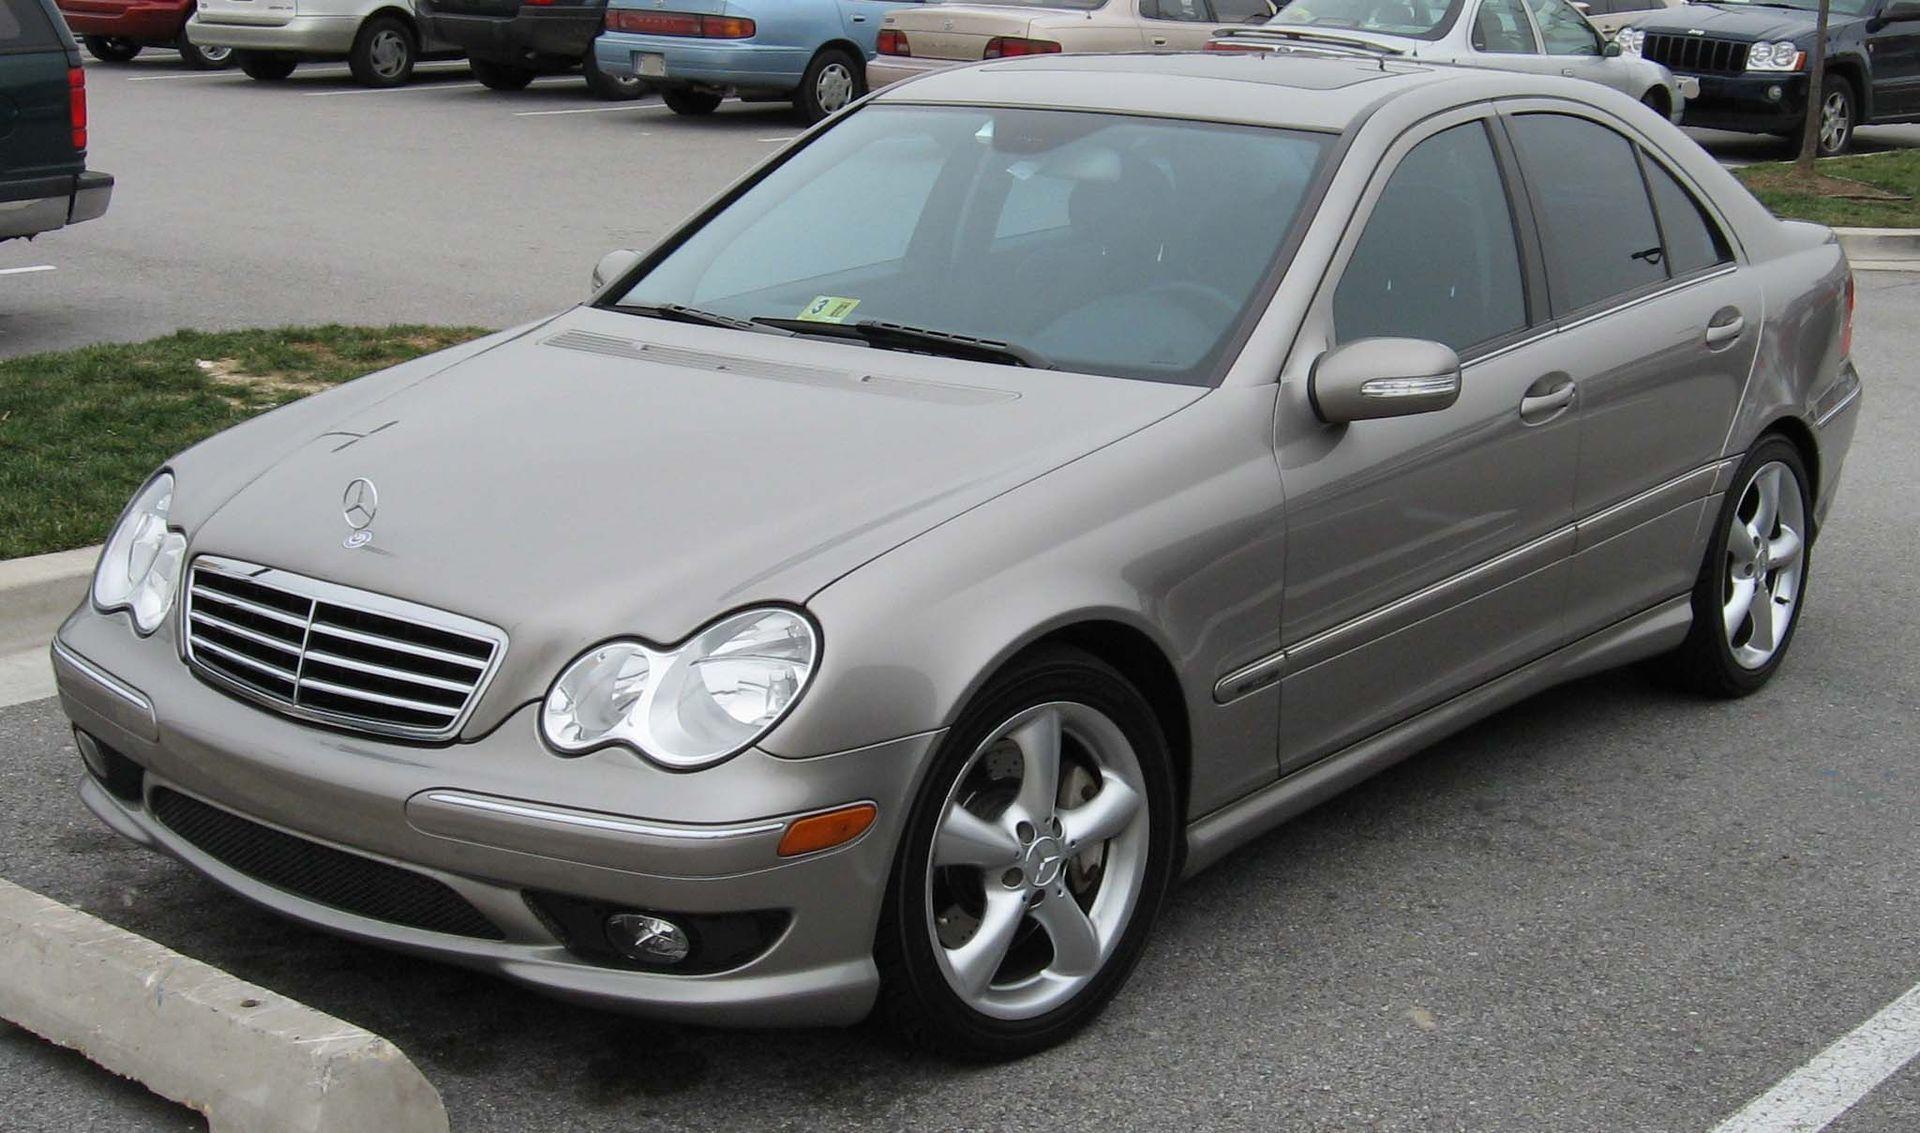 Mercedes Benz W203 Wikipedia